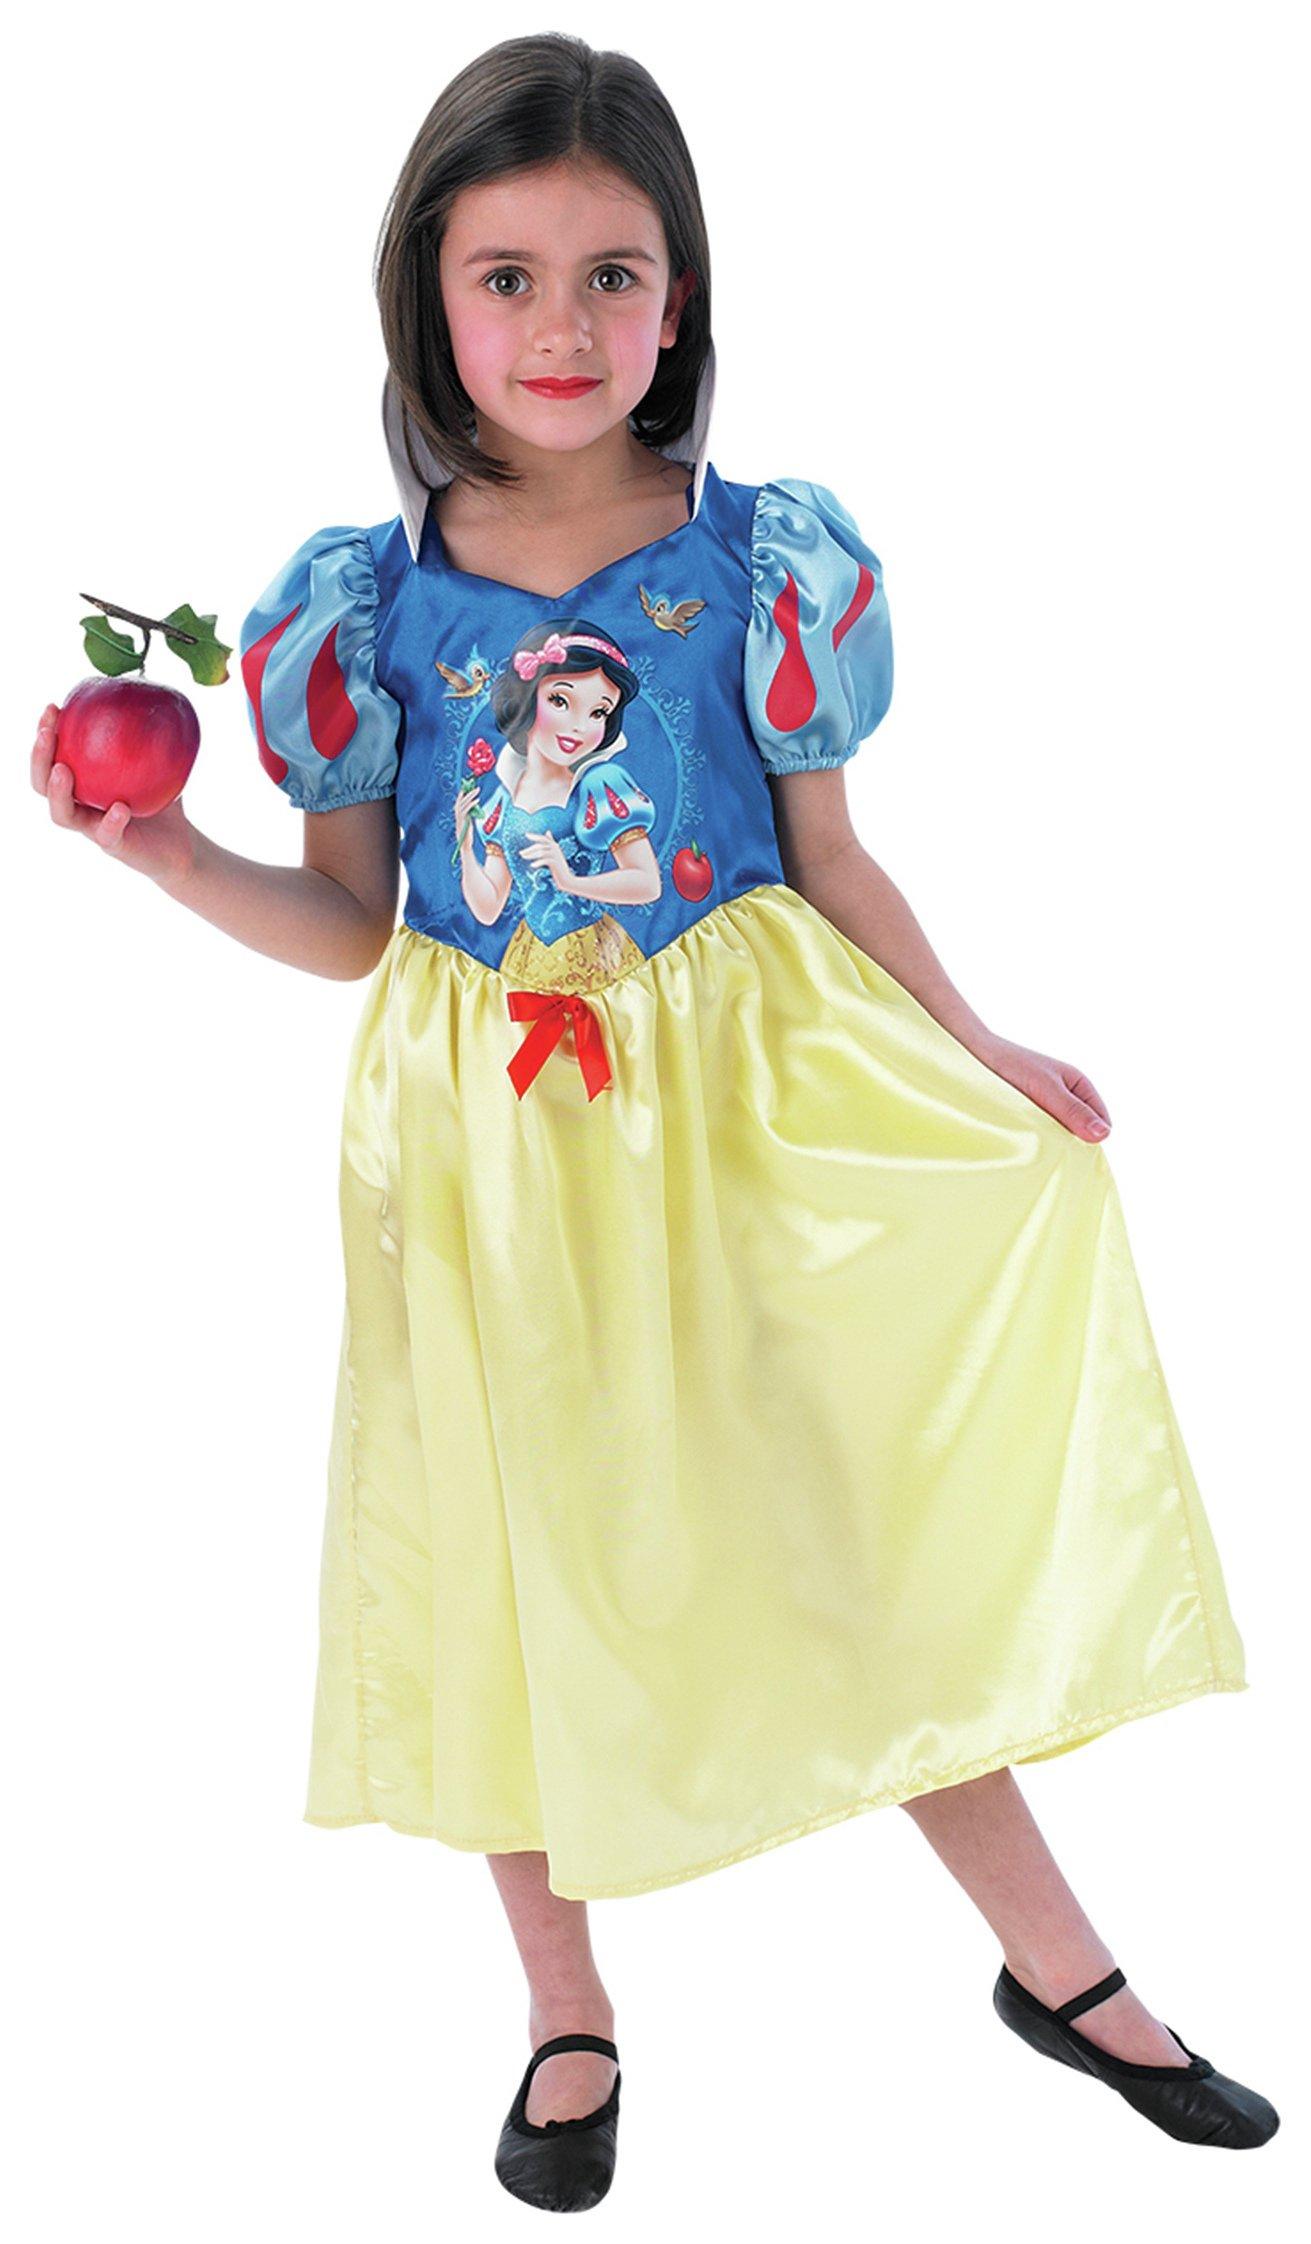 Image of Rubies Disney Snow White Costume - Large.